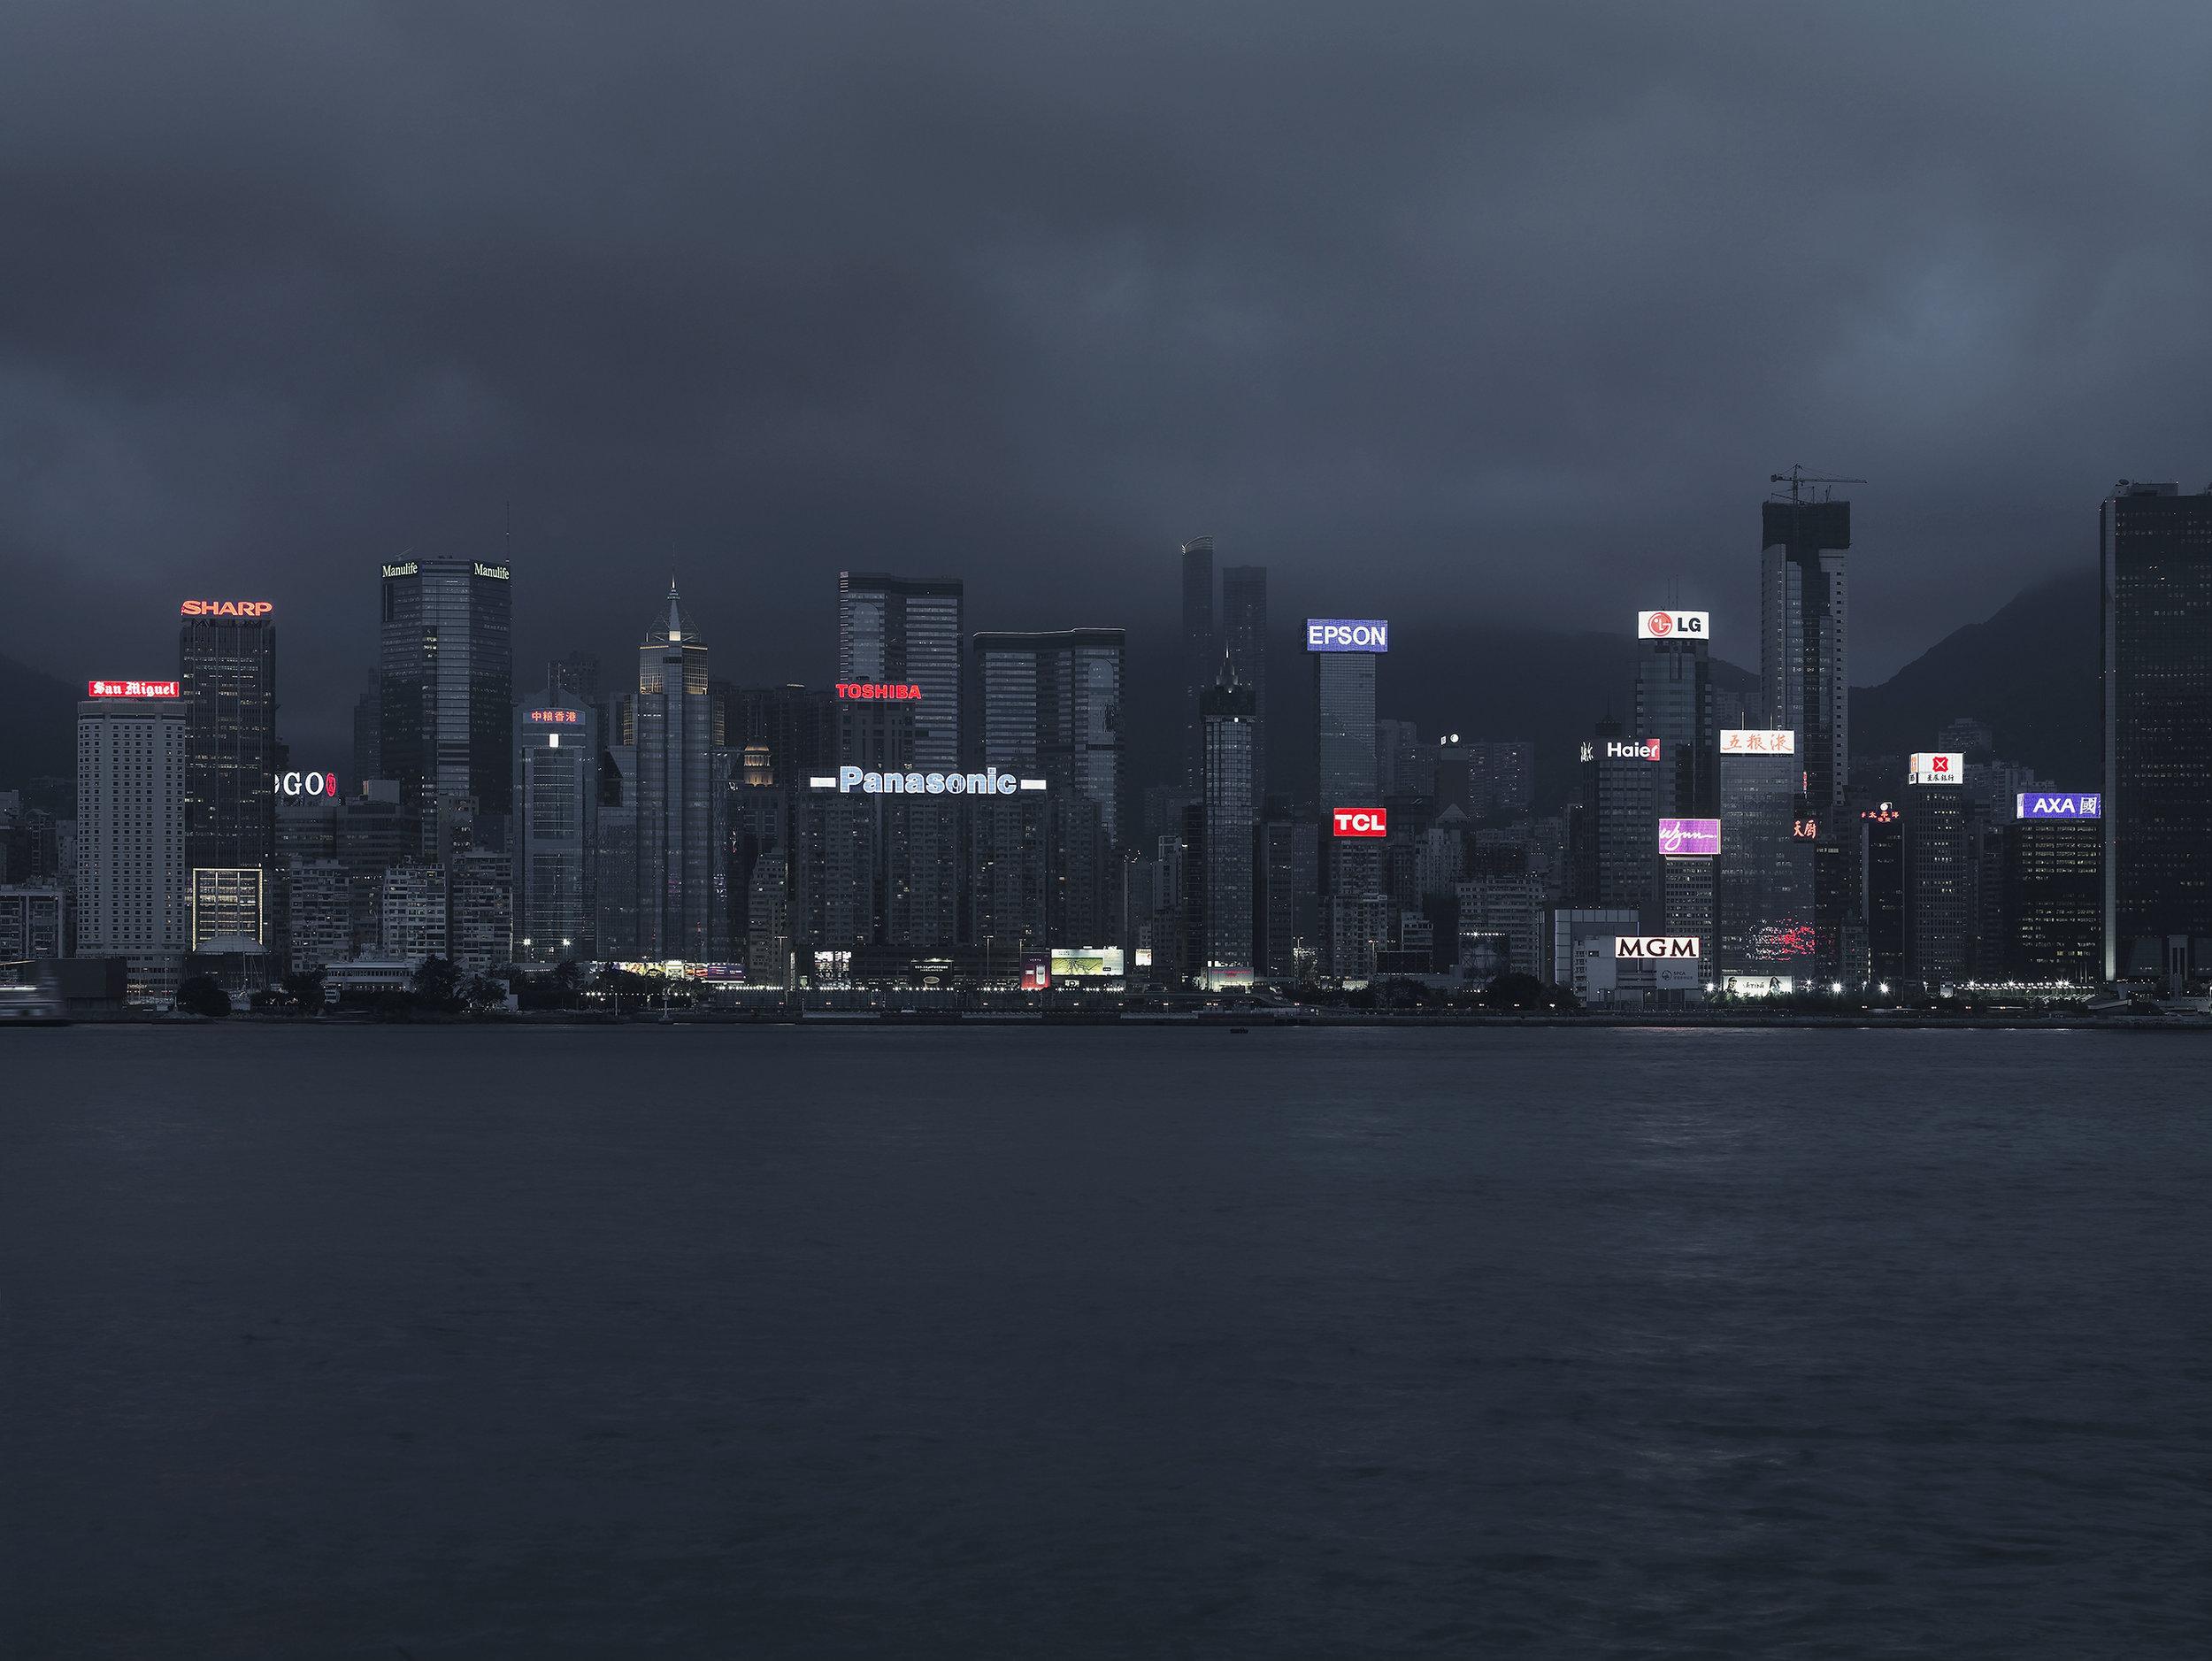 Buisness quarter 5, Hong-Kong, China, 2008.